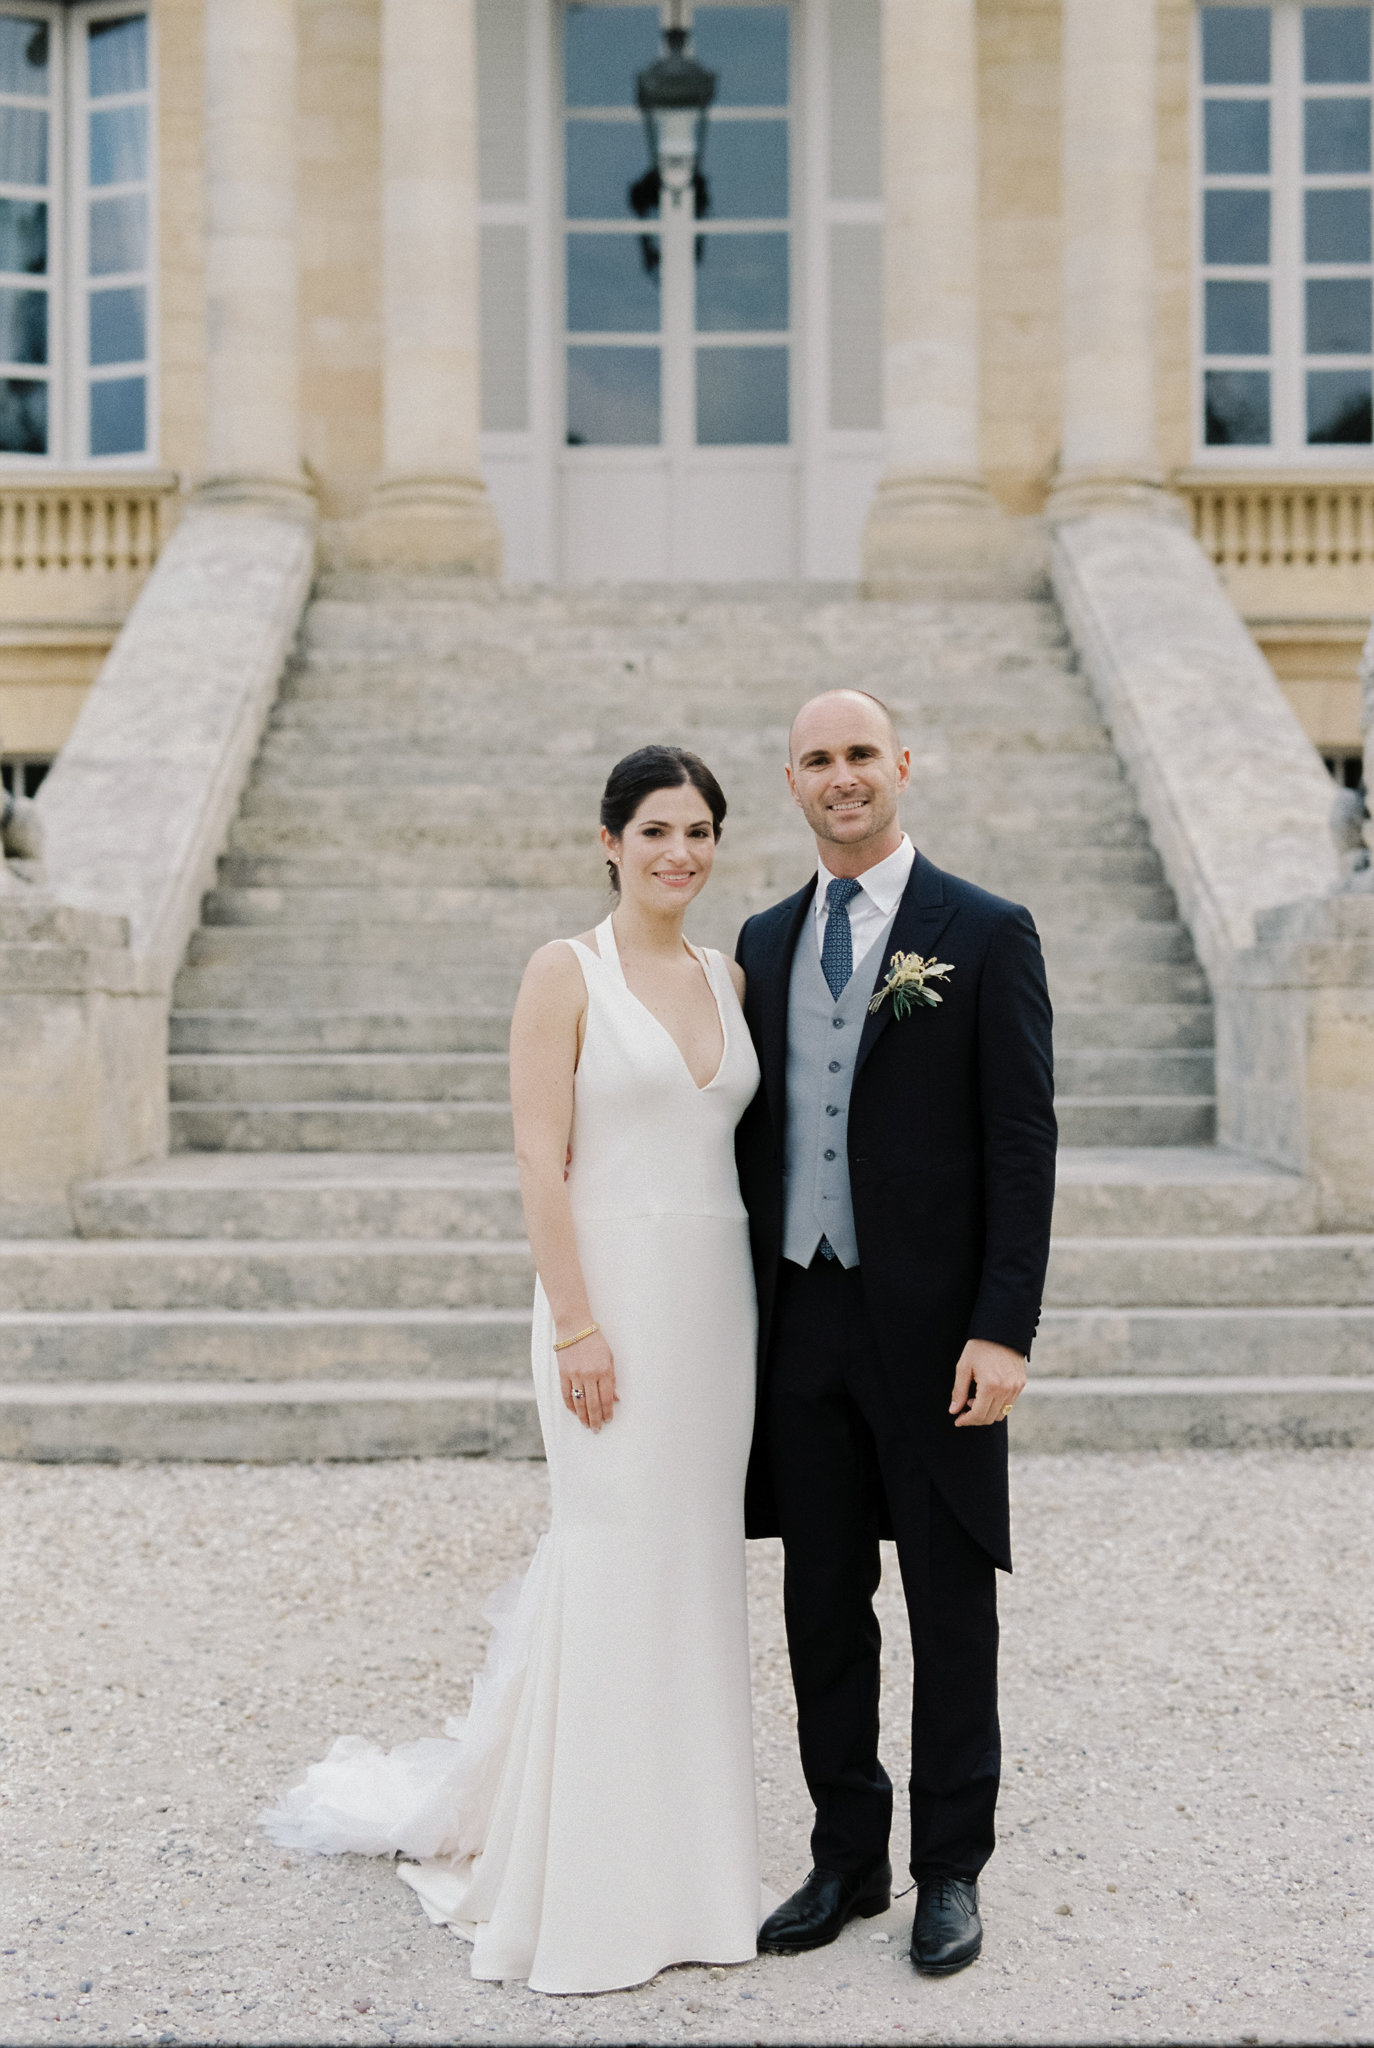 bride and groom pose outside Chateau La Louviere wedding venue